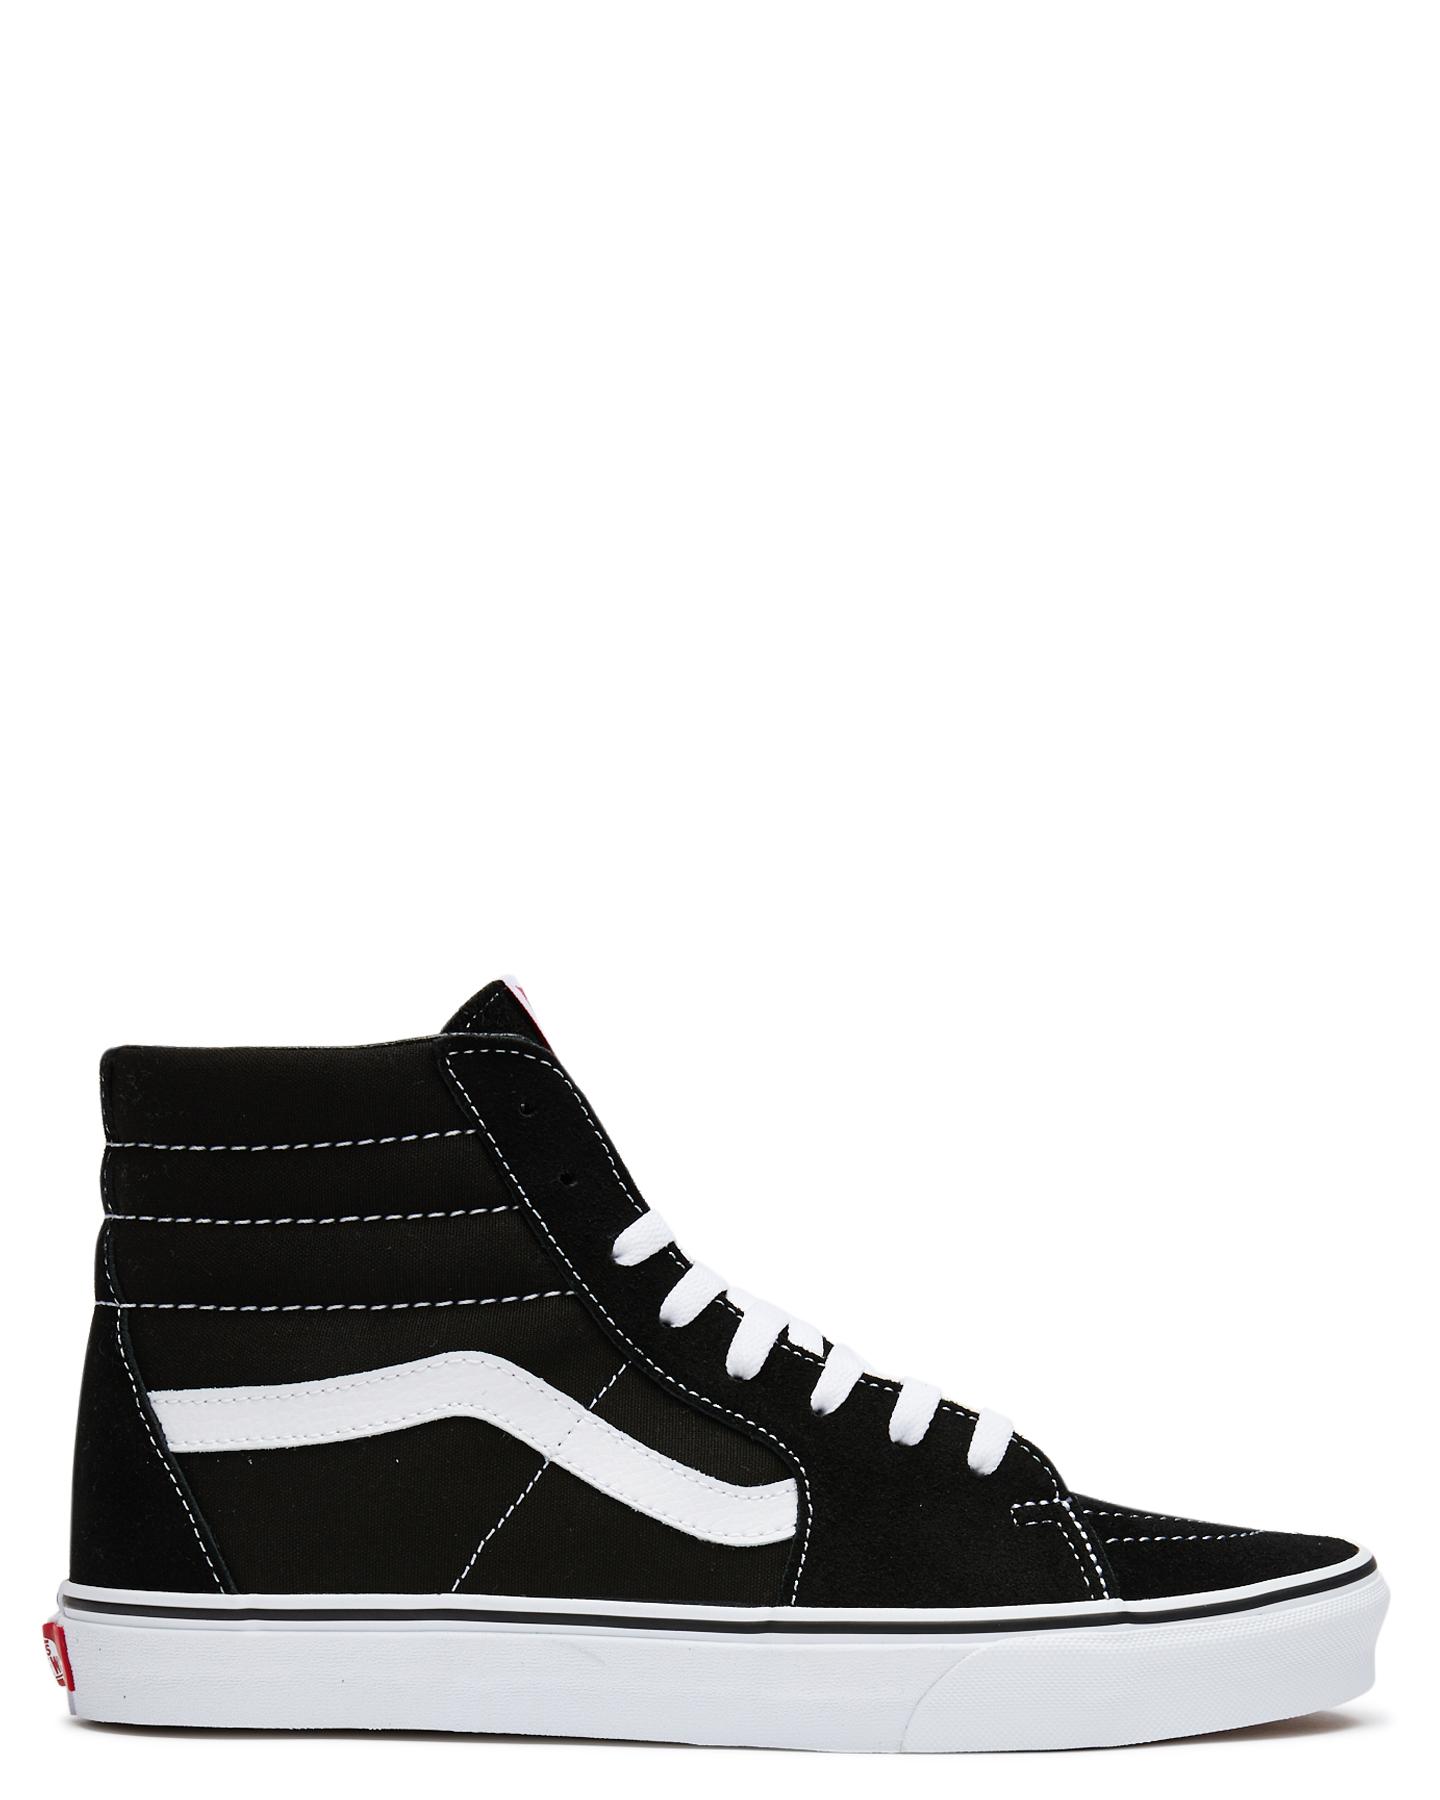 Vans Womens Sk8 Hi Shoe Black Womens Sneakers Size 5.5  906da40ac4